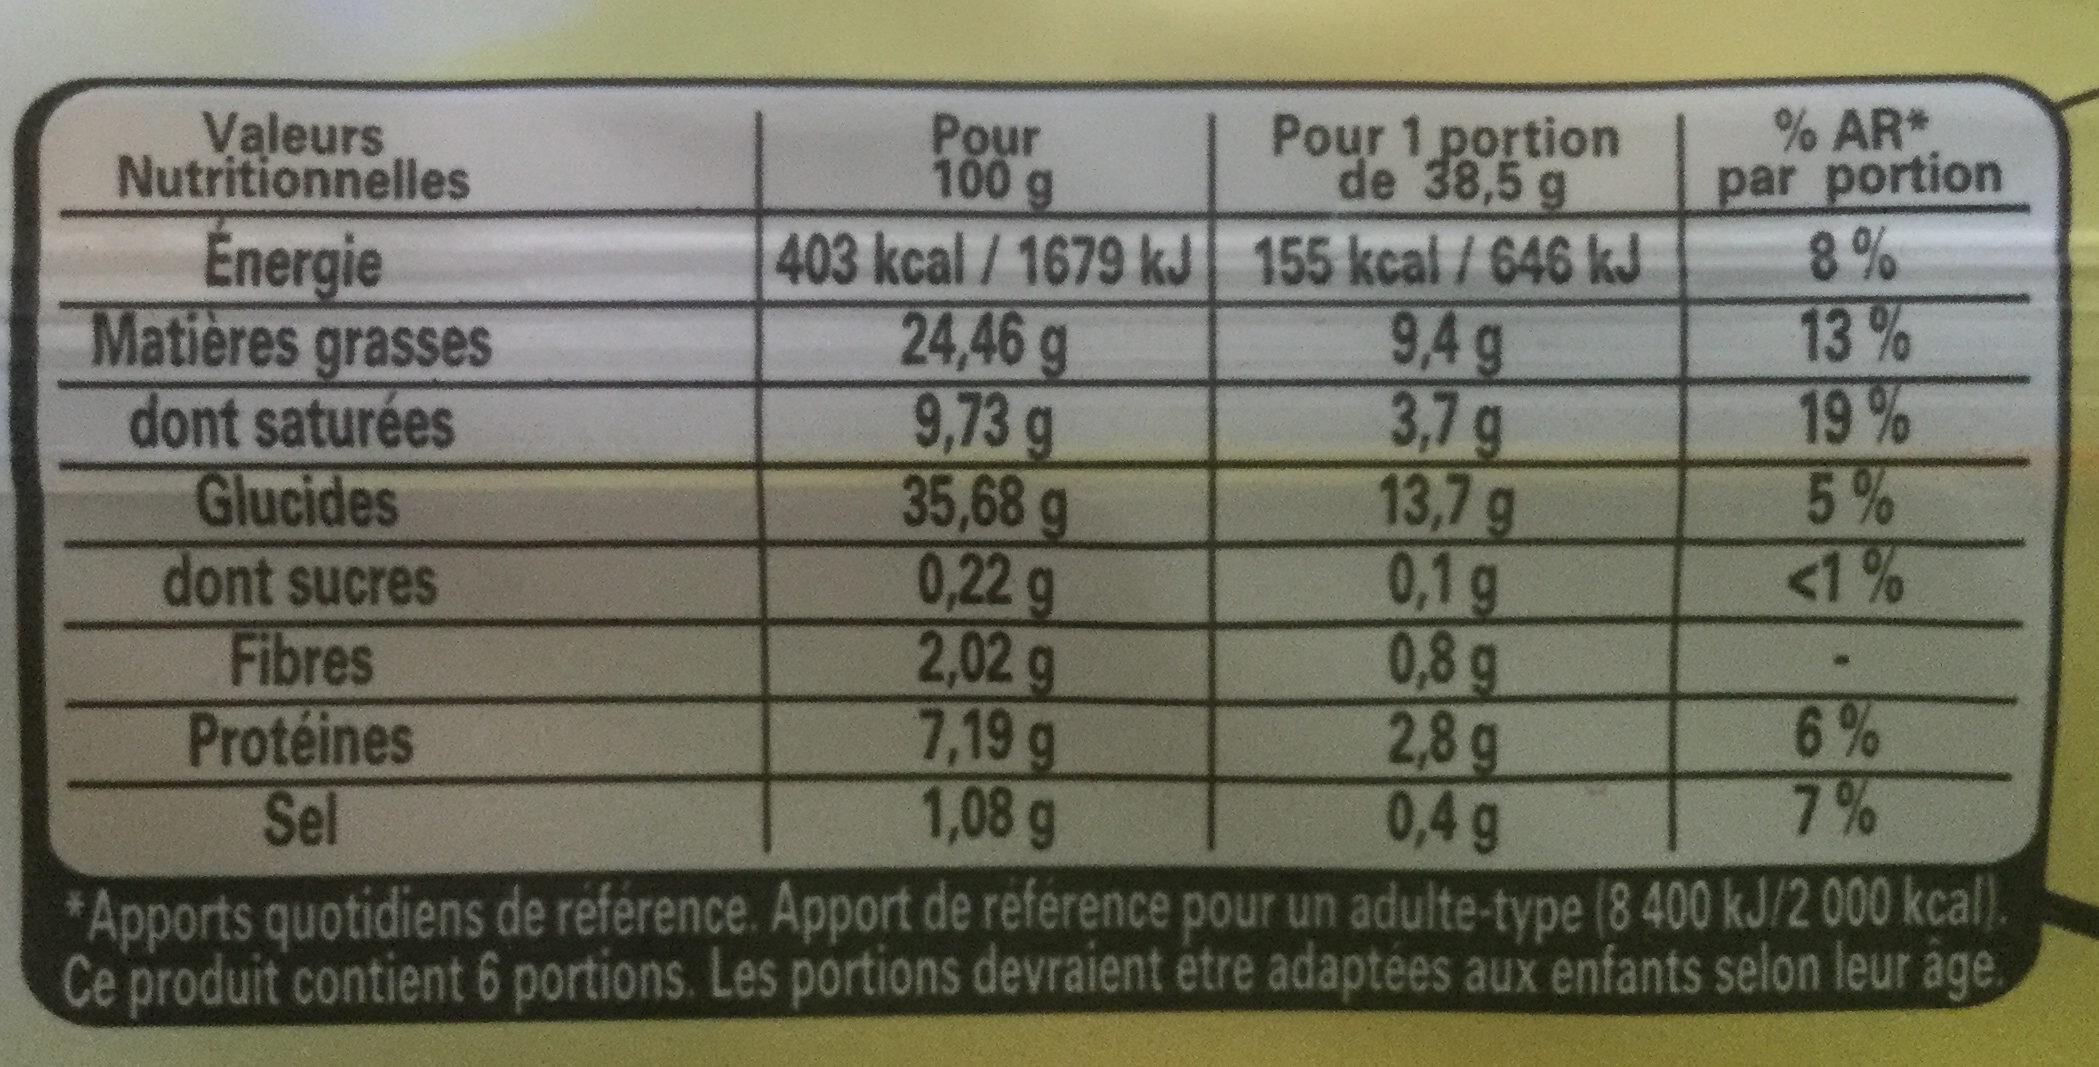 Tarte en or feuilletée - Nutrition facts - fr